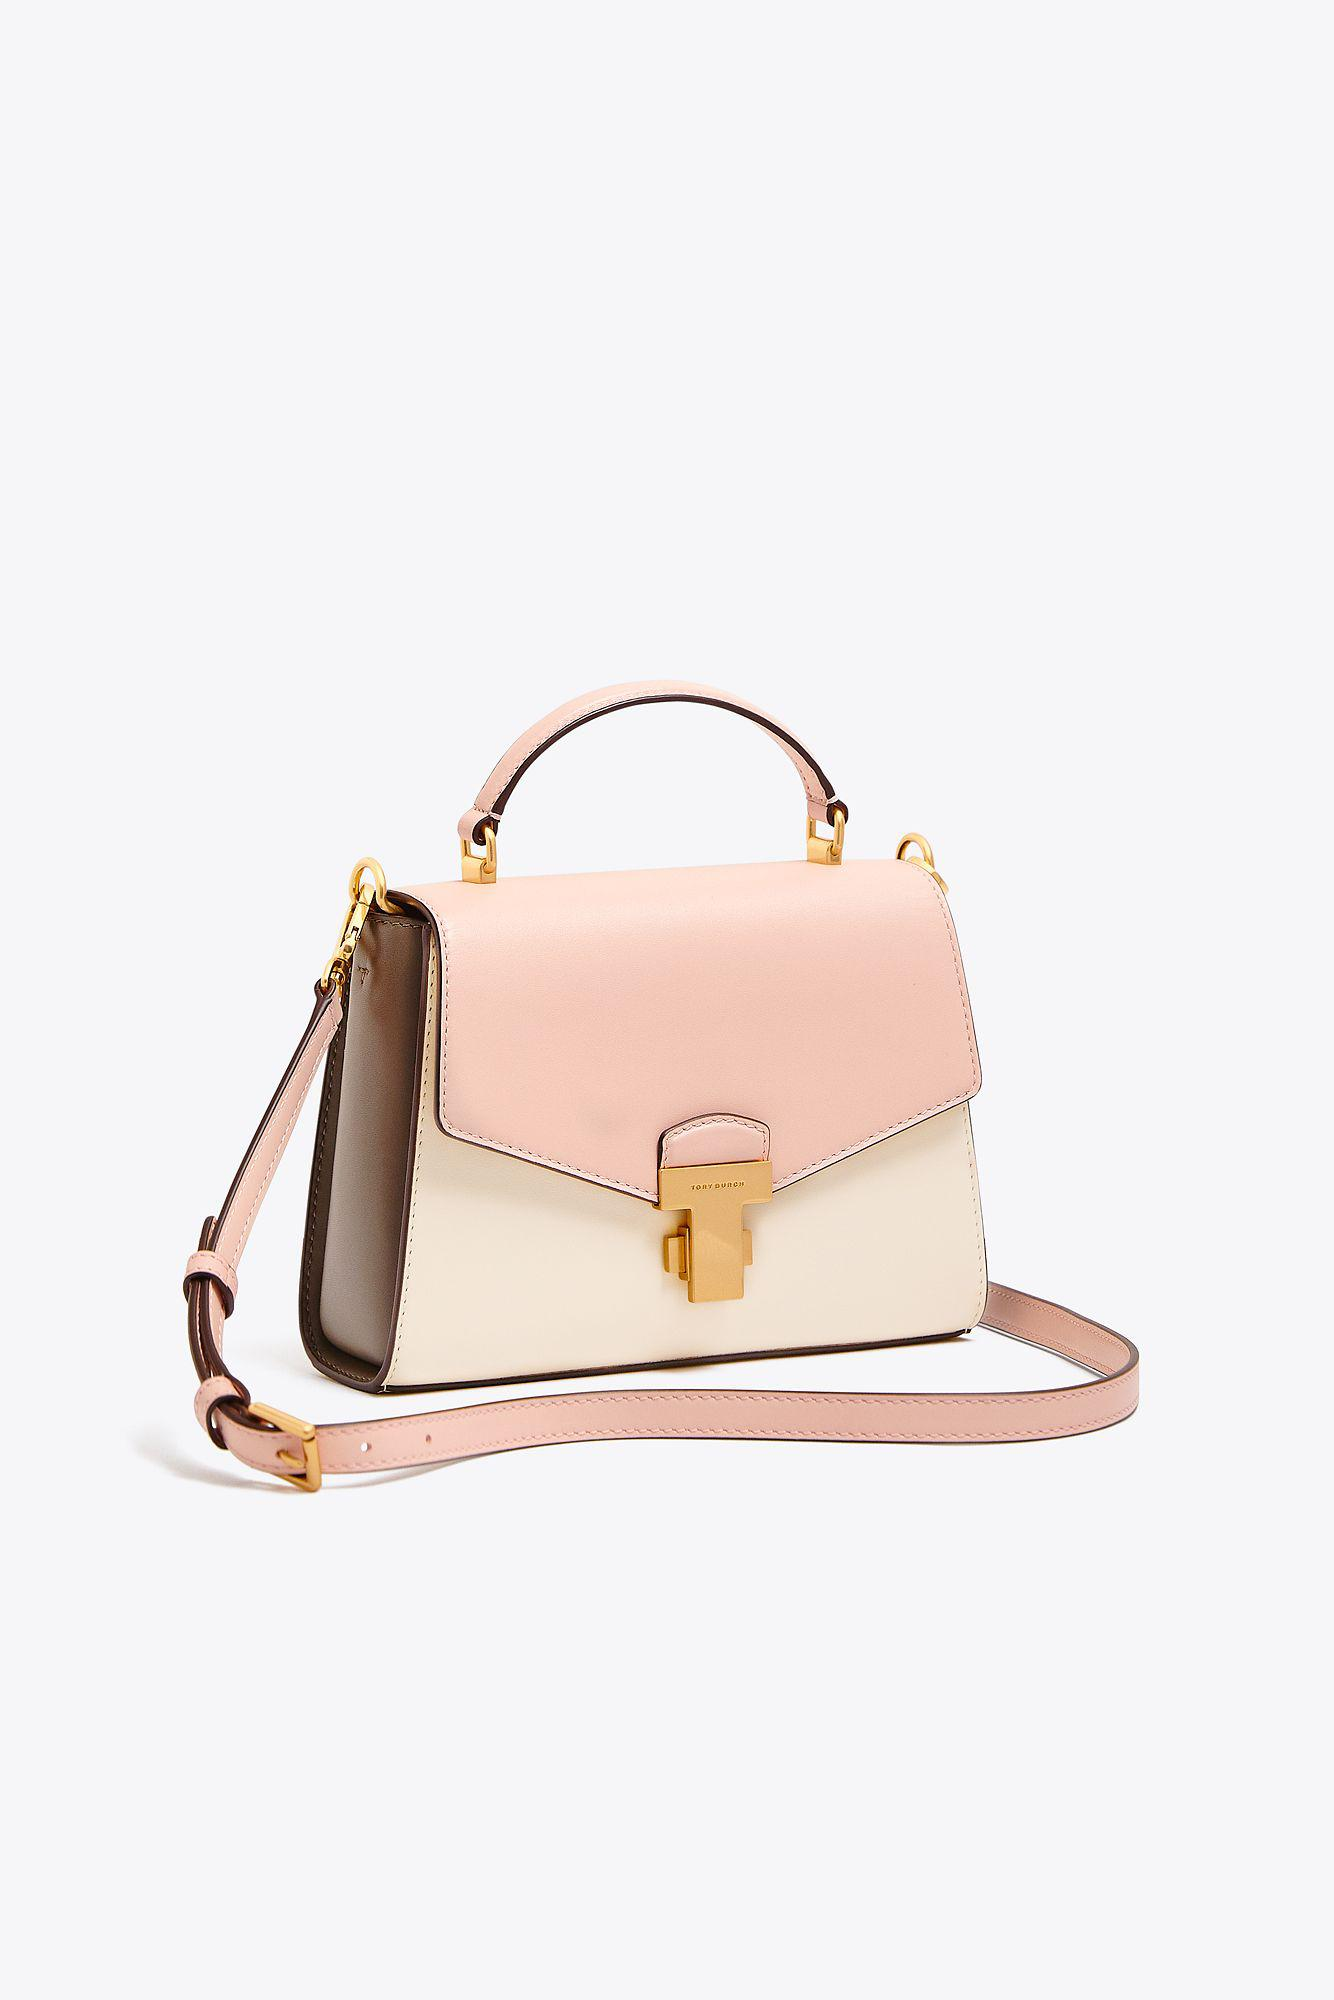 5698c9b755df Lyst - Tory Burch Juliette Color-block Small Top-handle Satchel in Pink